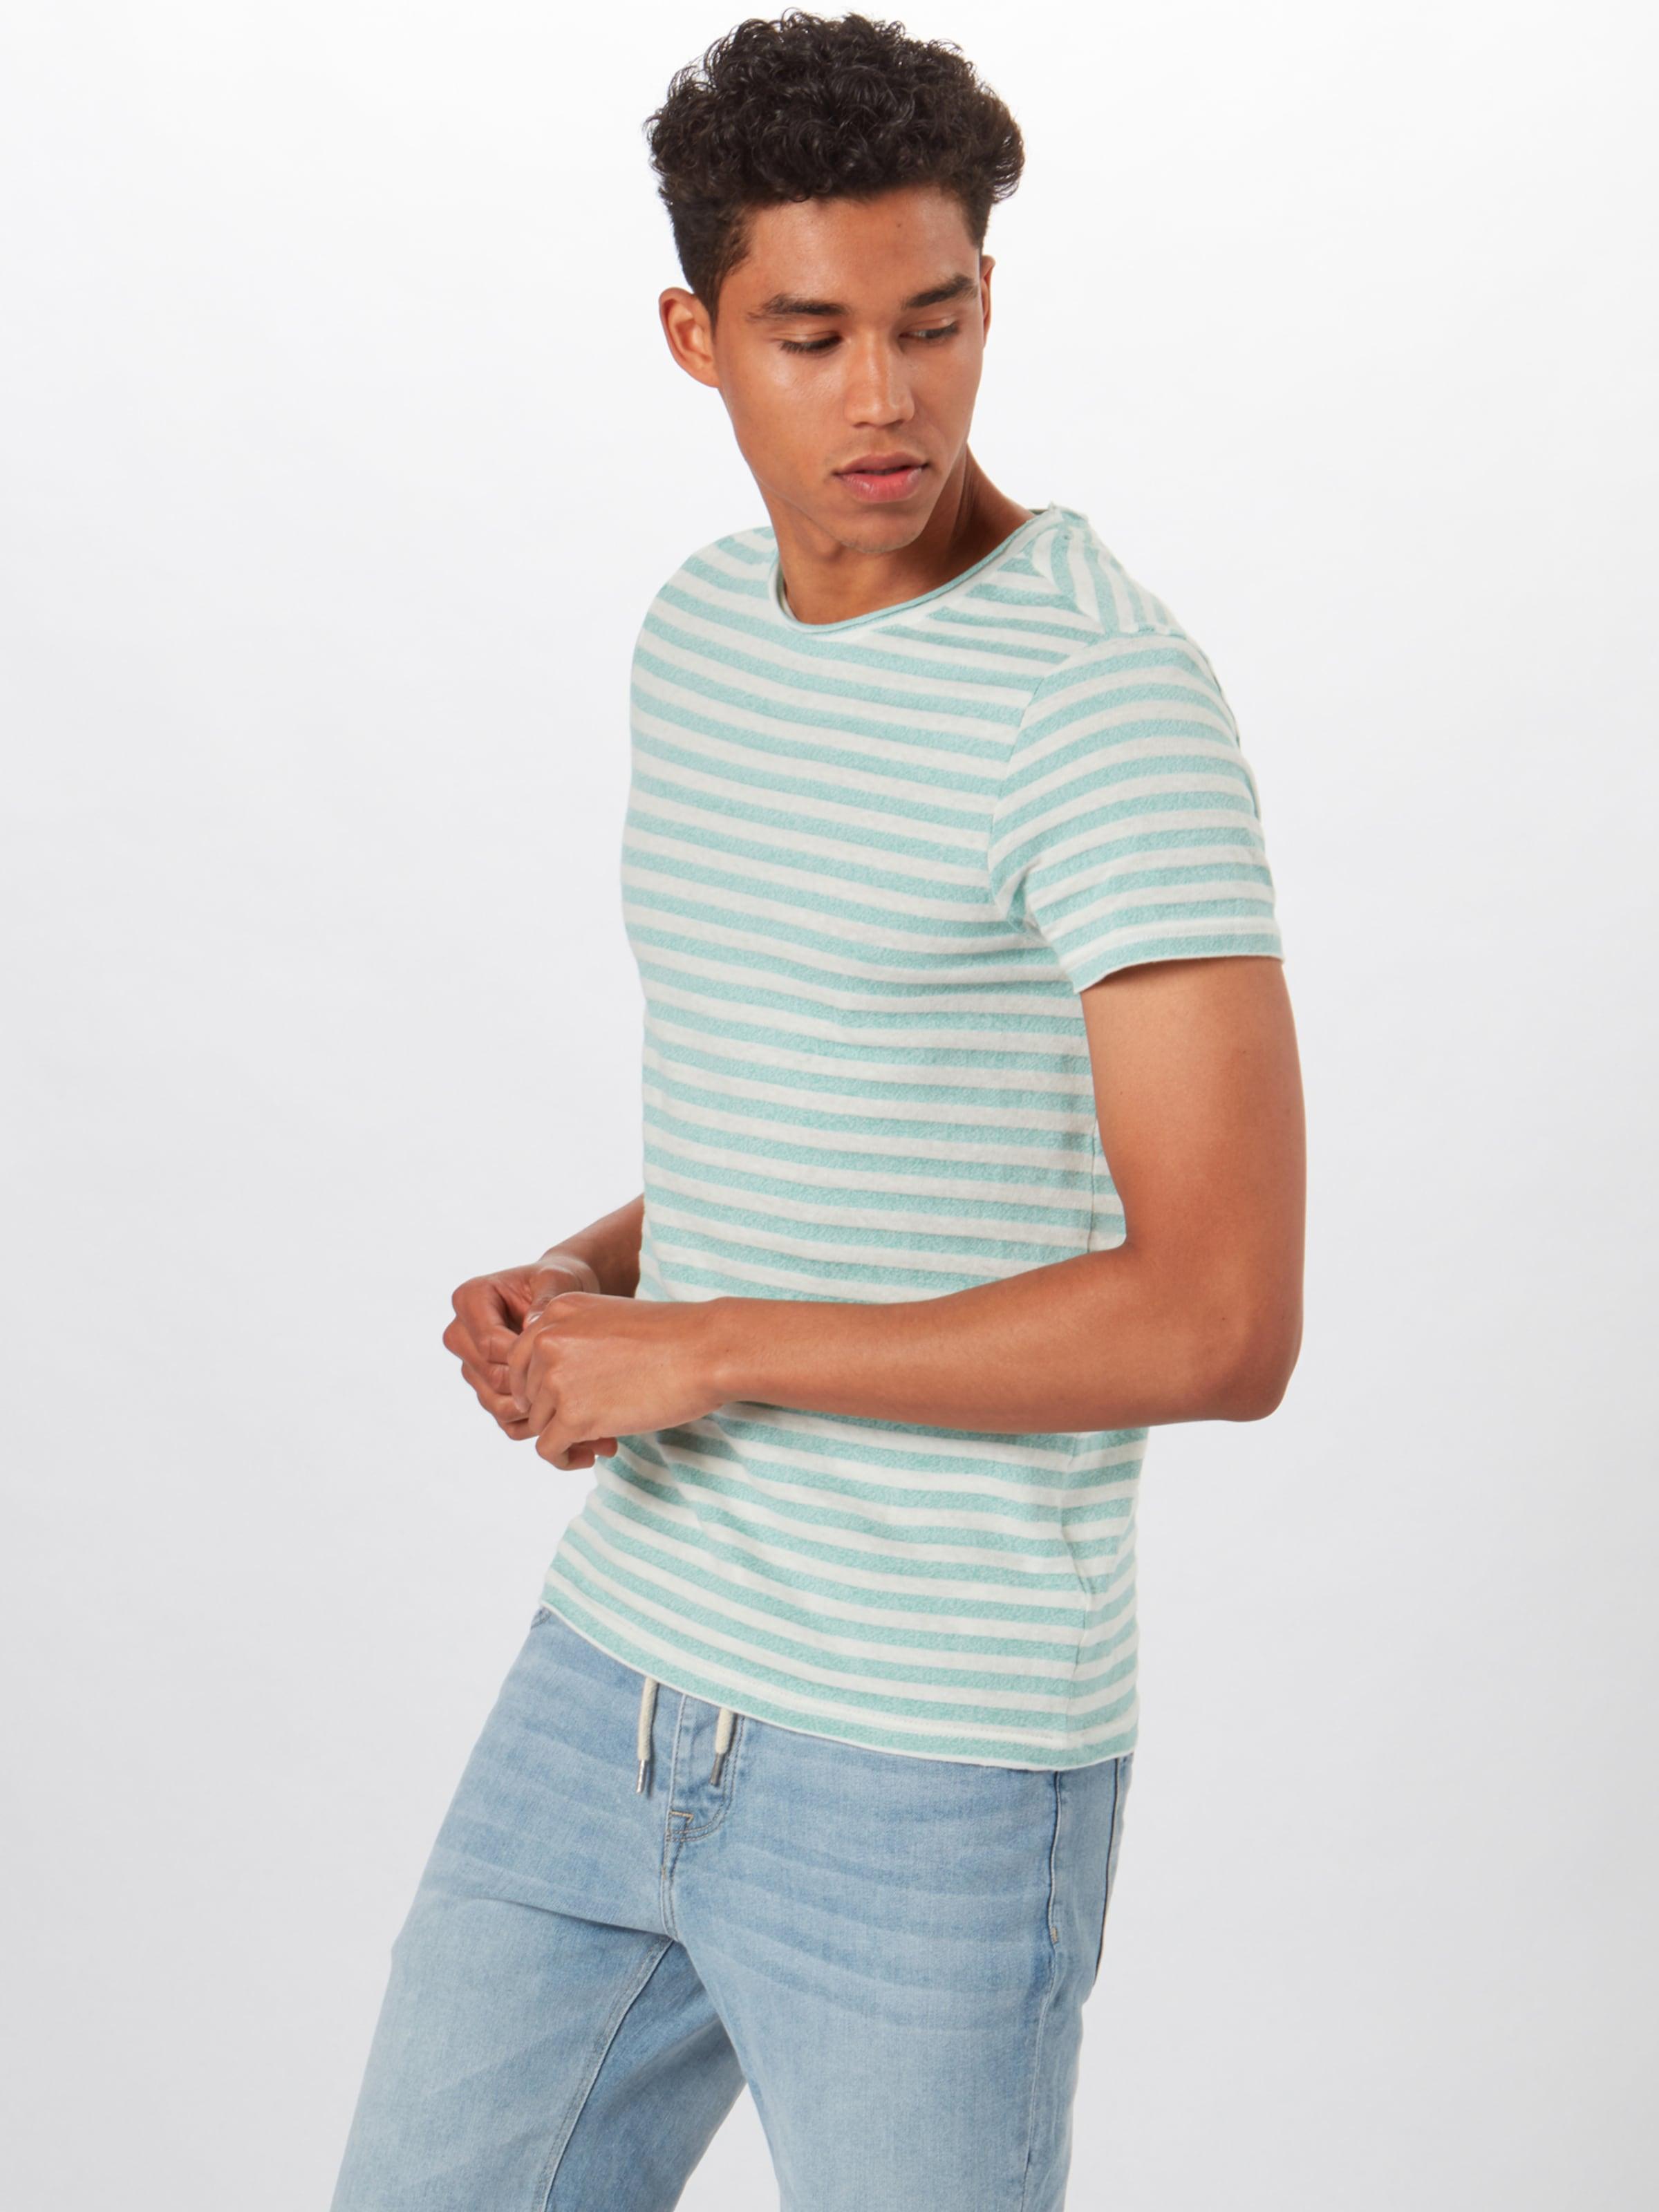 shirt T Review In MintWeiß 'brokenstripe' D9YHIWE2